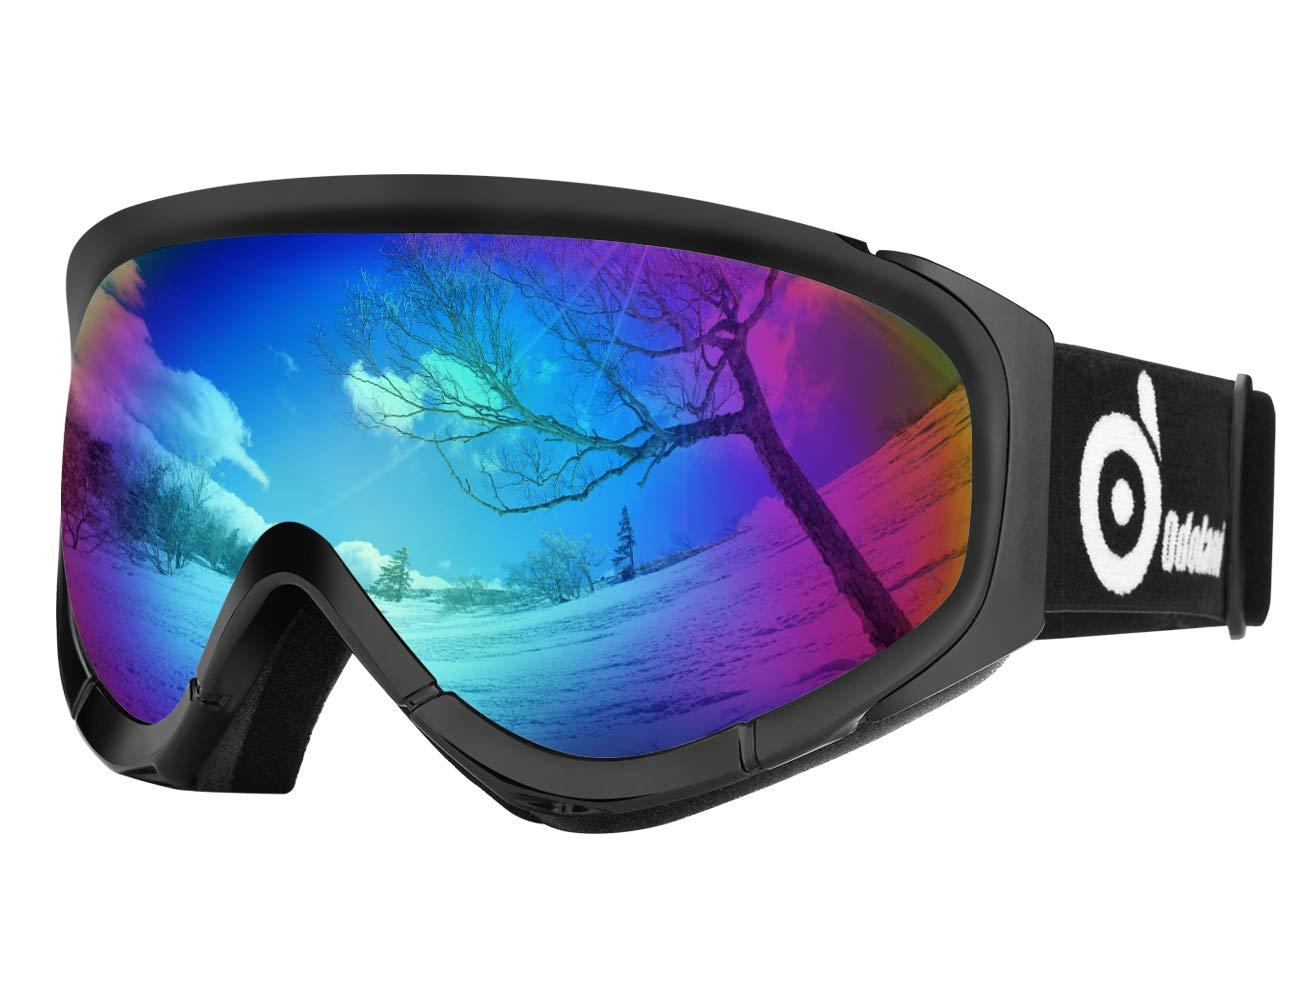 Masque de ski/snowboard Odoland